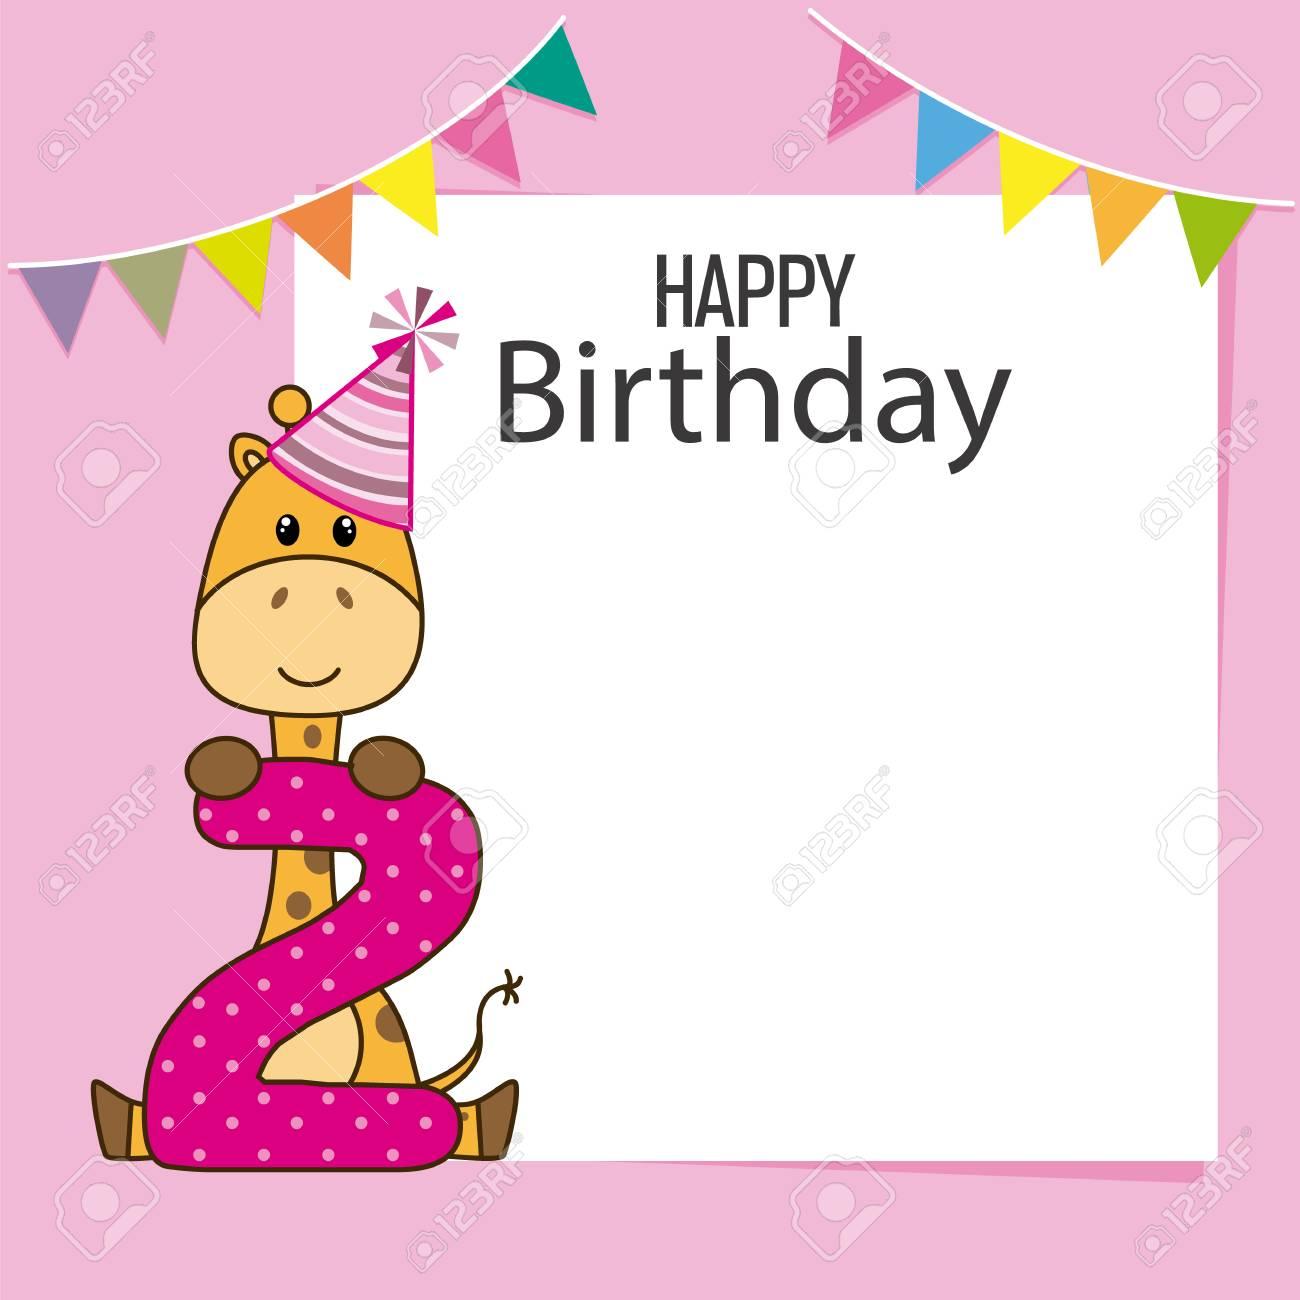 Giraffe Birthday Card Space For Text Or Photo Standard Bild